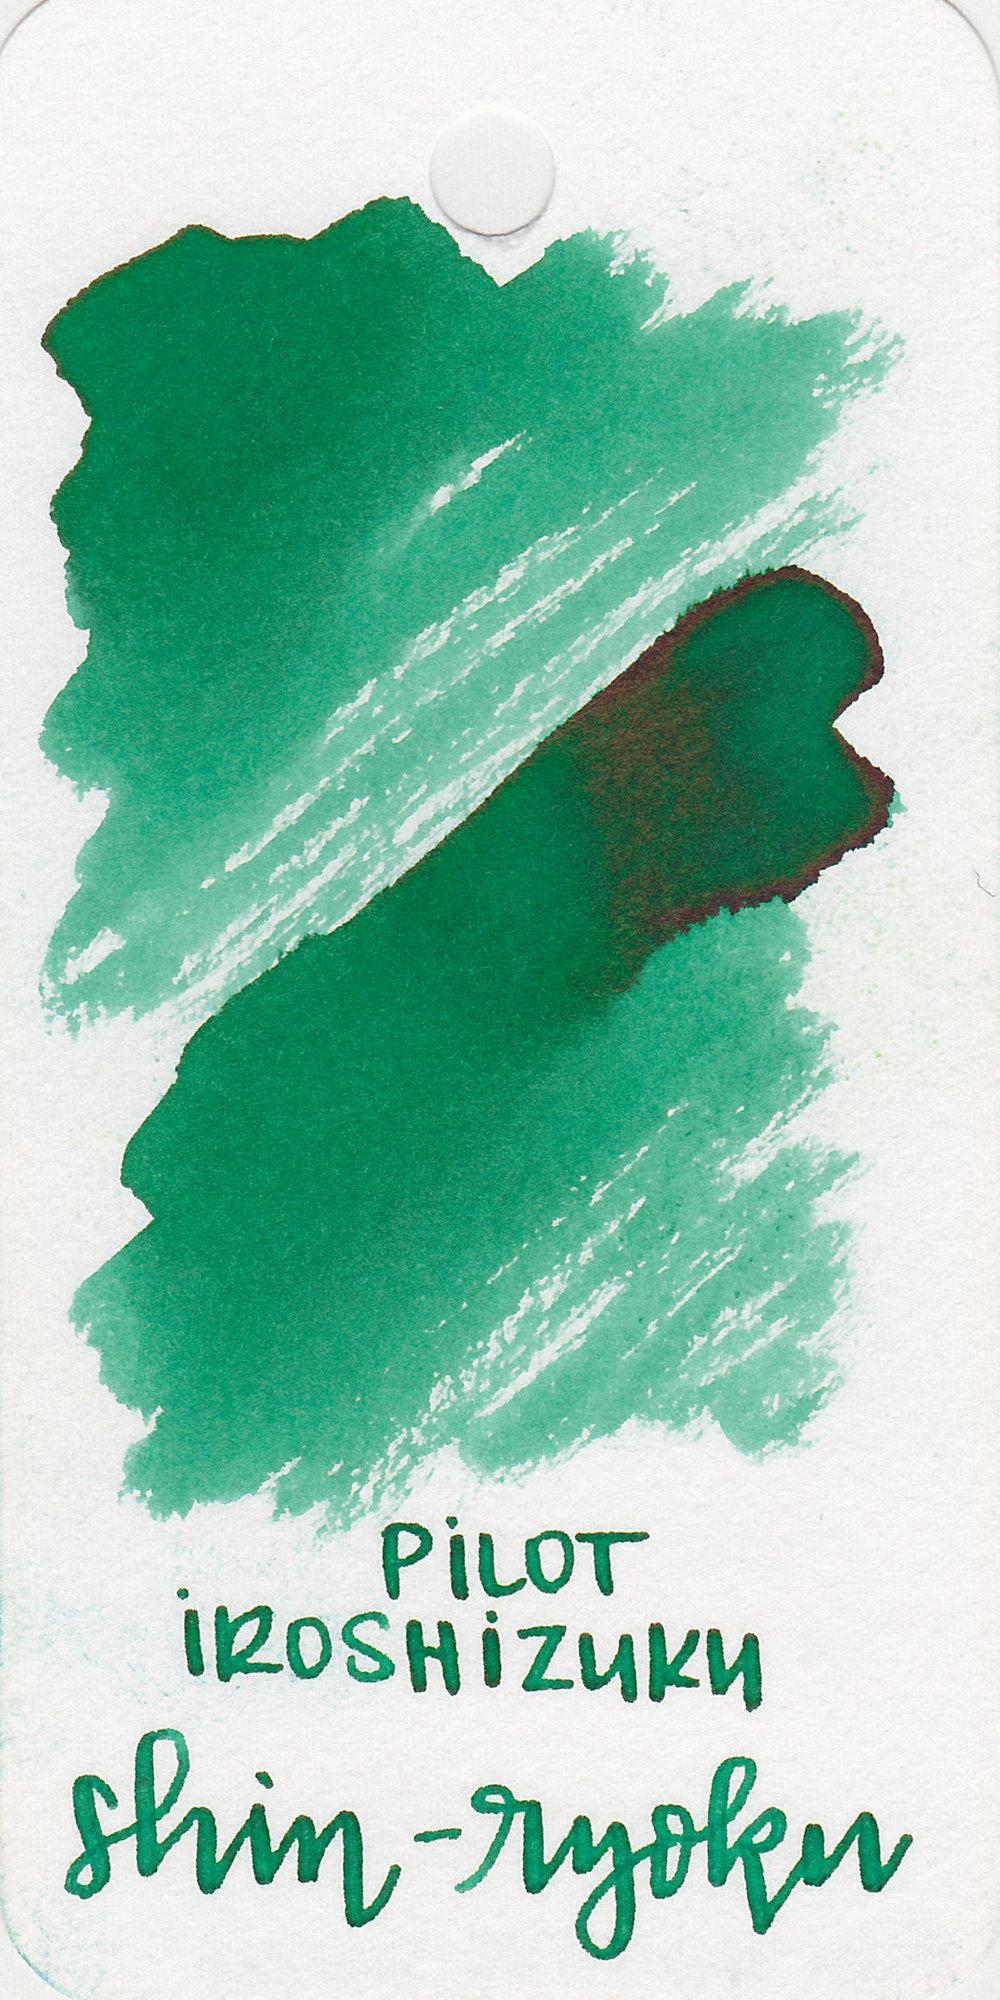 The color: - Shin-ryoku is a pretty medium green.